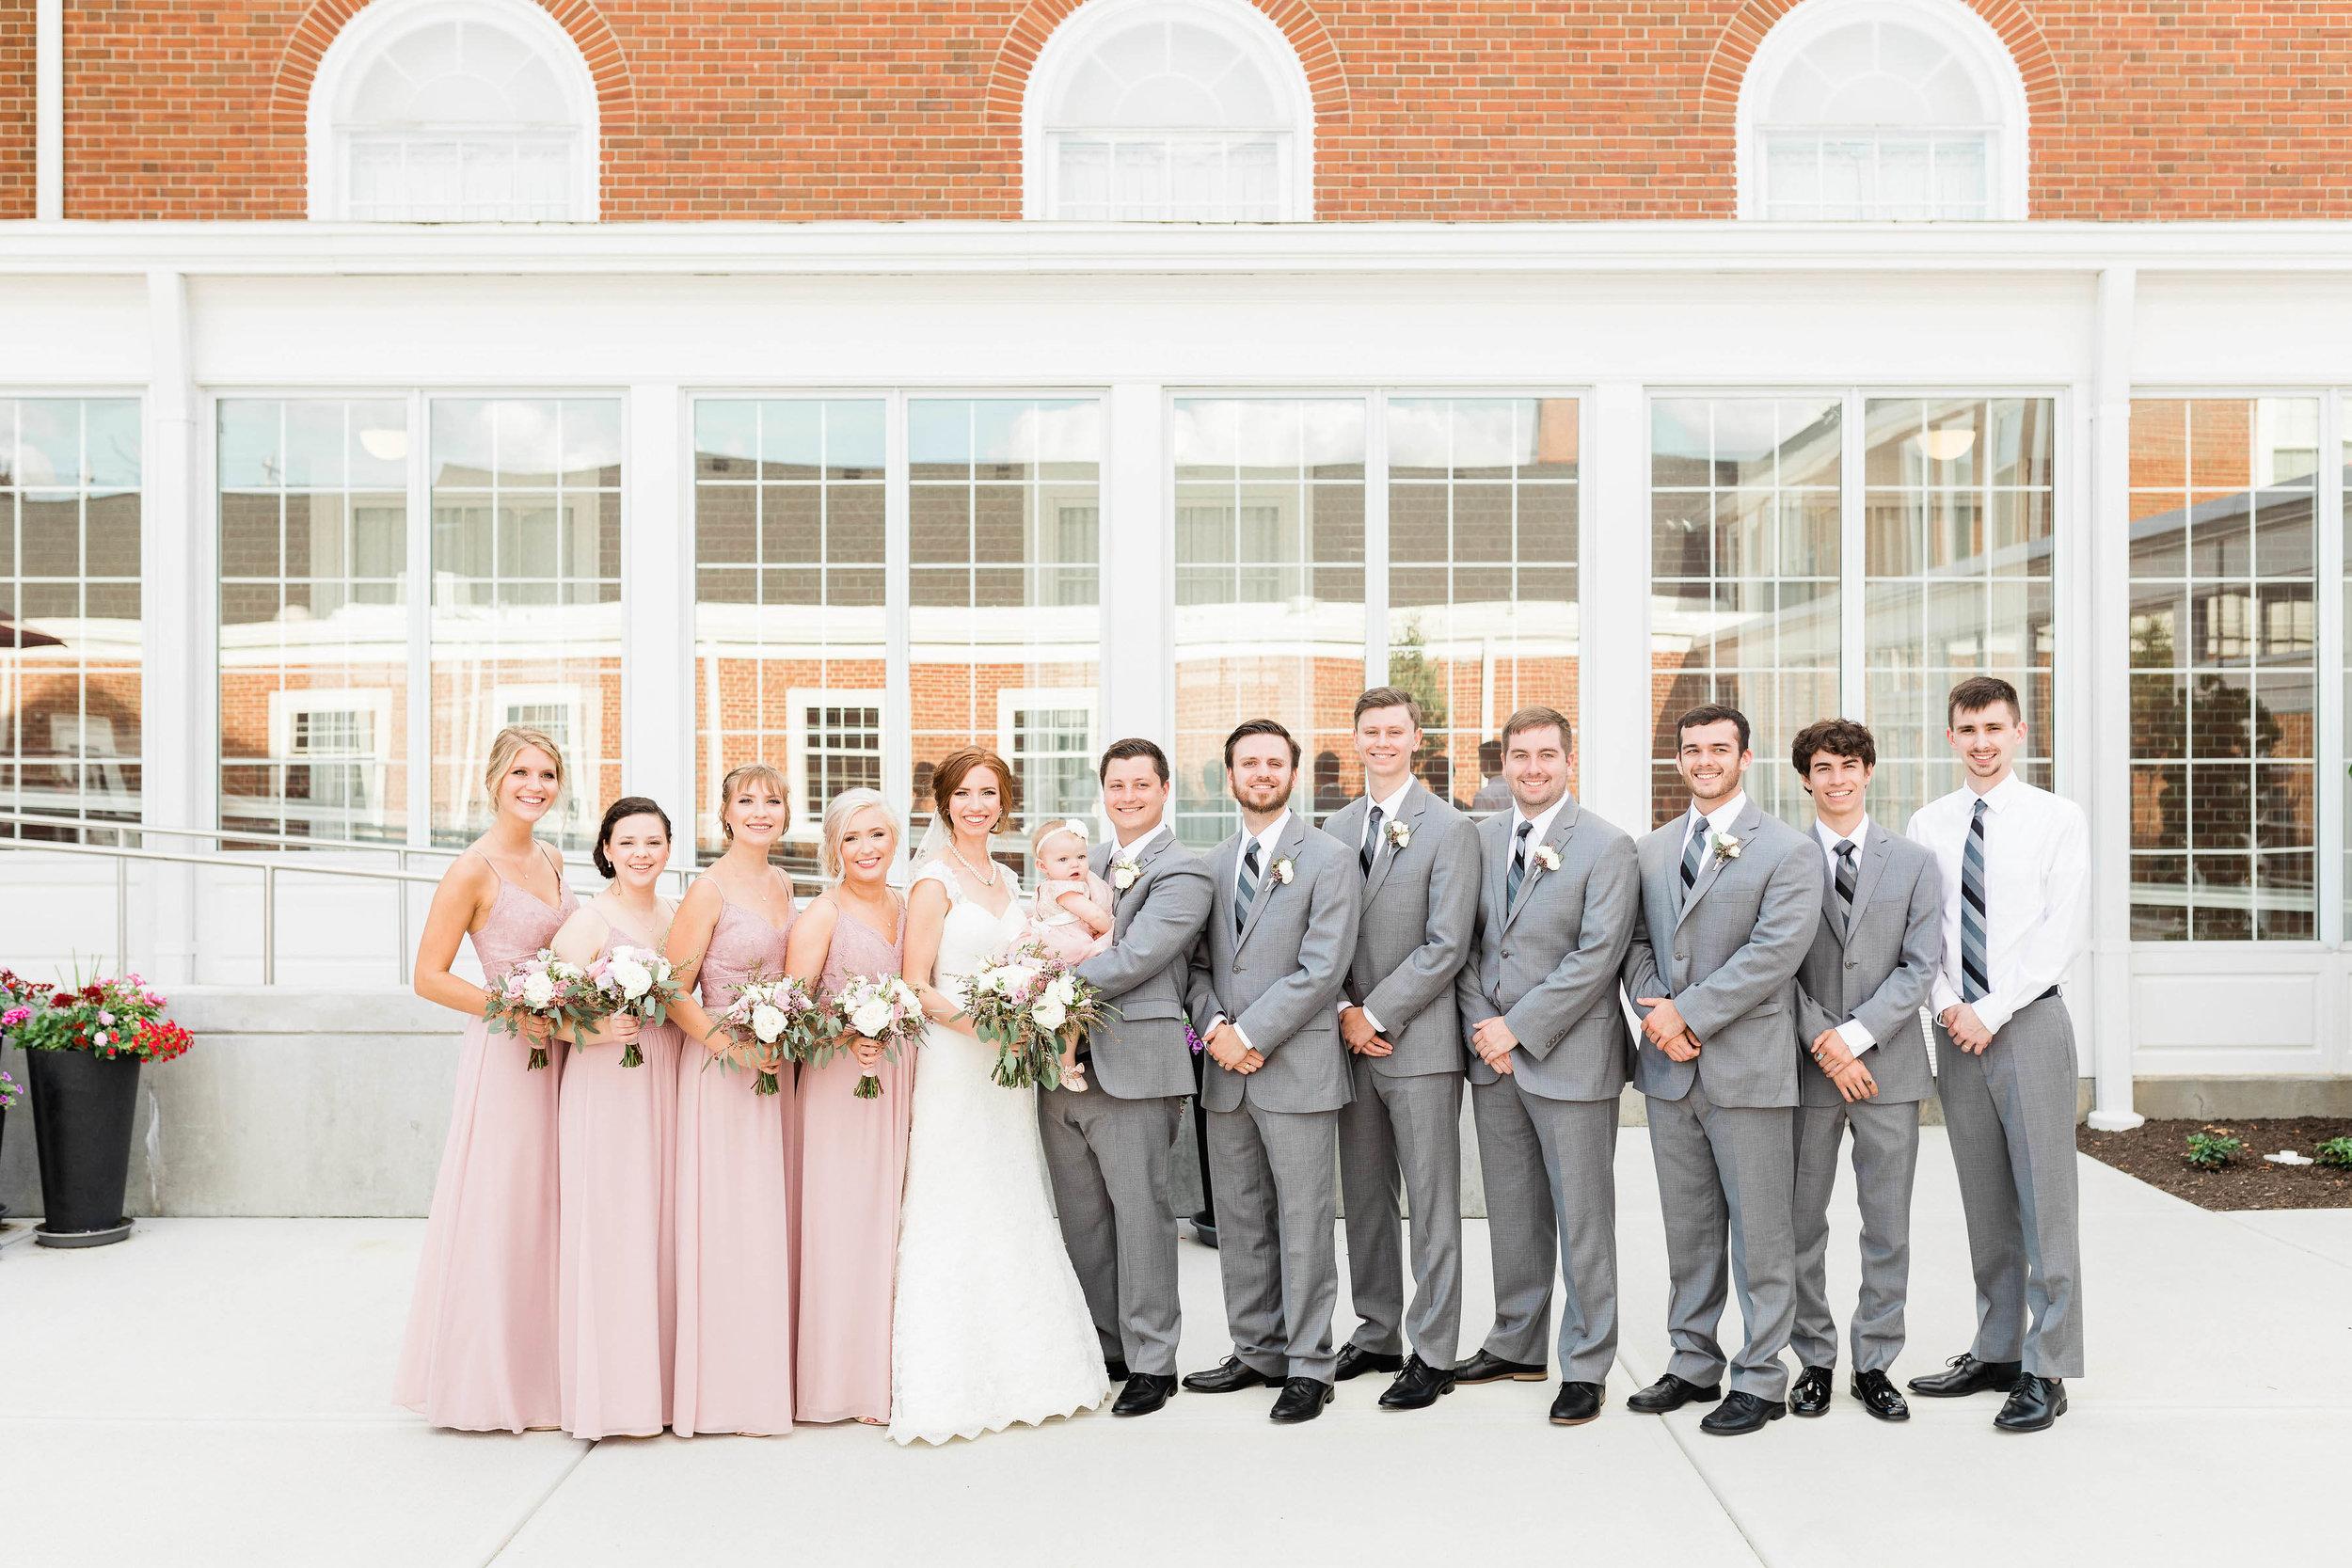 lauren day photography cincinnati wedding photographer bridal party pictures-6.jpg